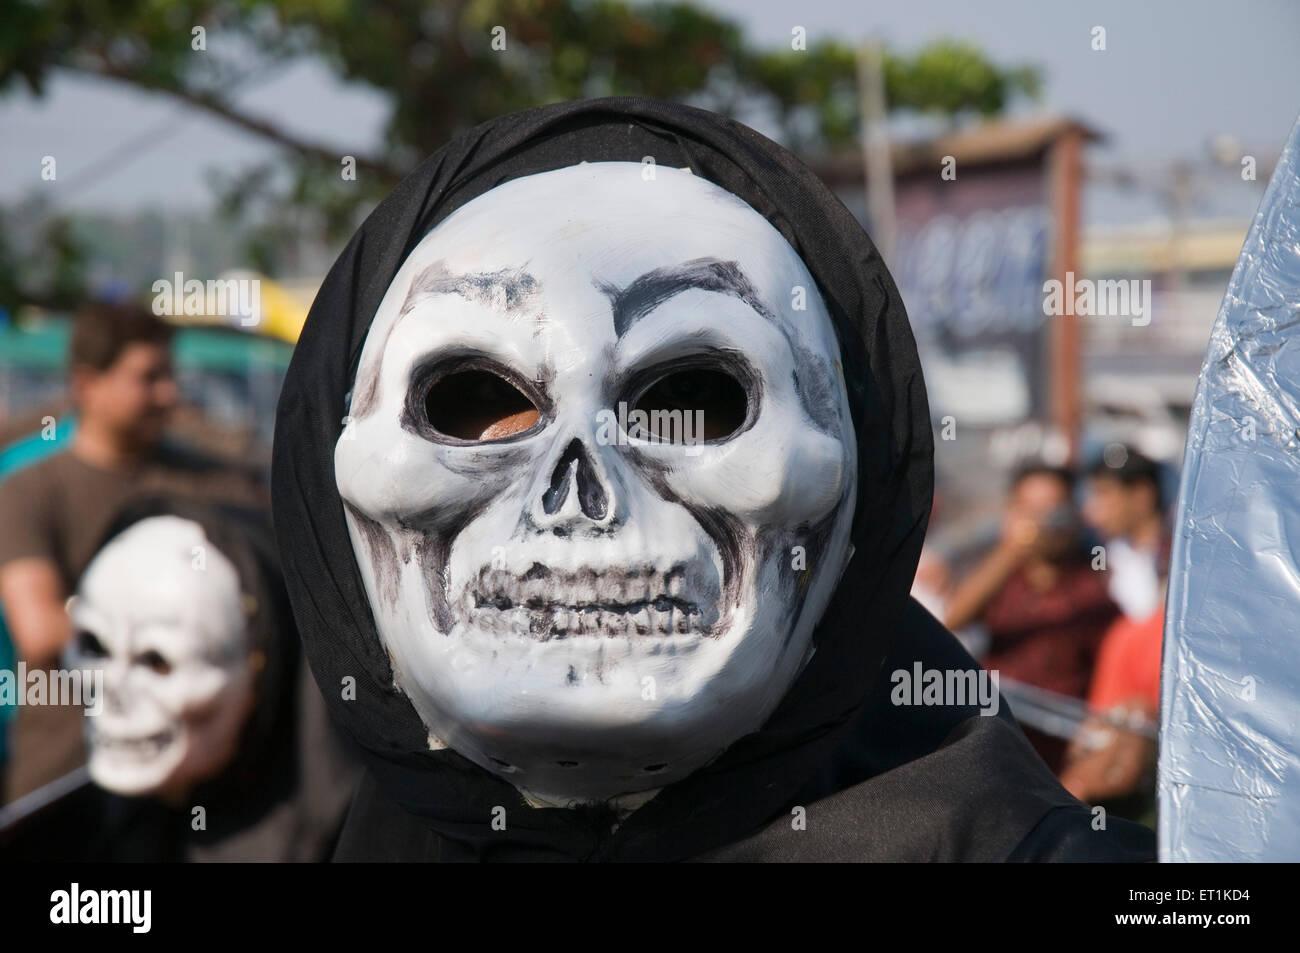 White skeleton masks and black robes Goa Maharashtra India Asia March 2011 - Stock Image